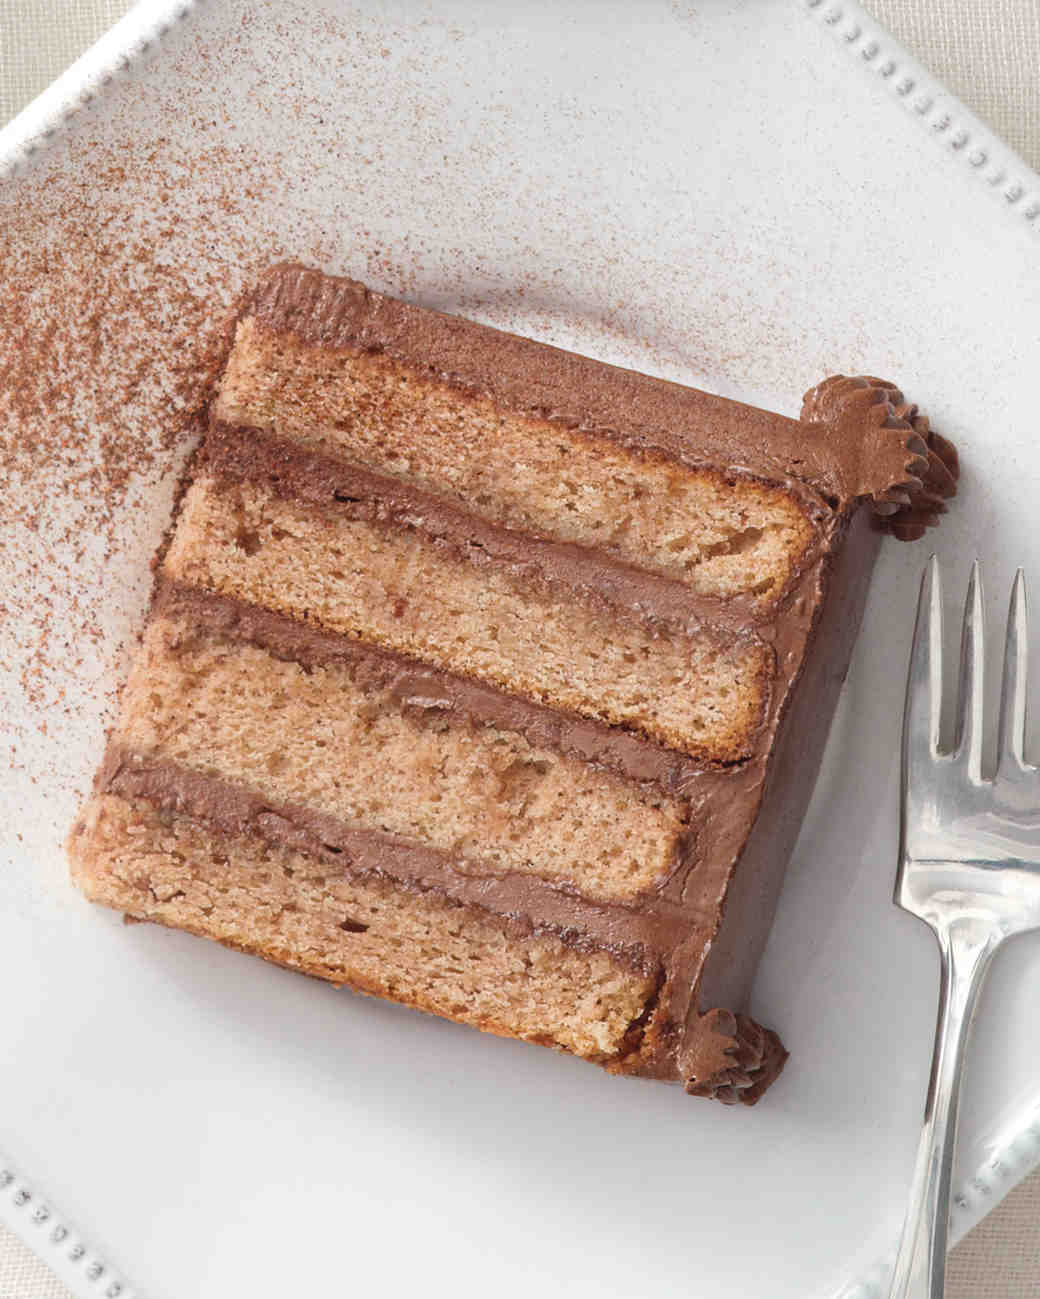 dessert-slices-zesty-mexican-hot-chocolate-mwd109994.jpg